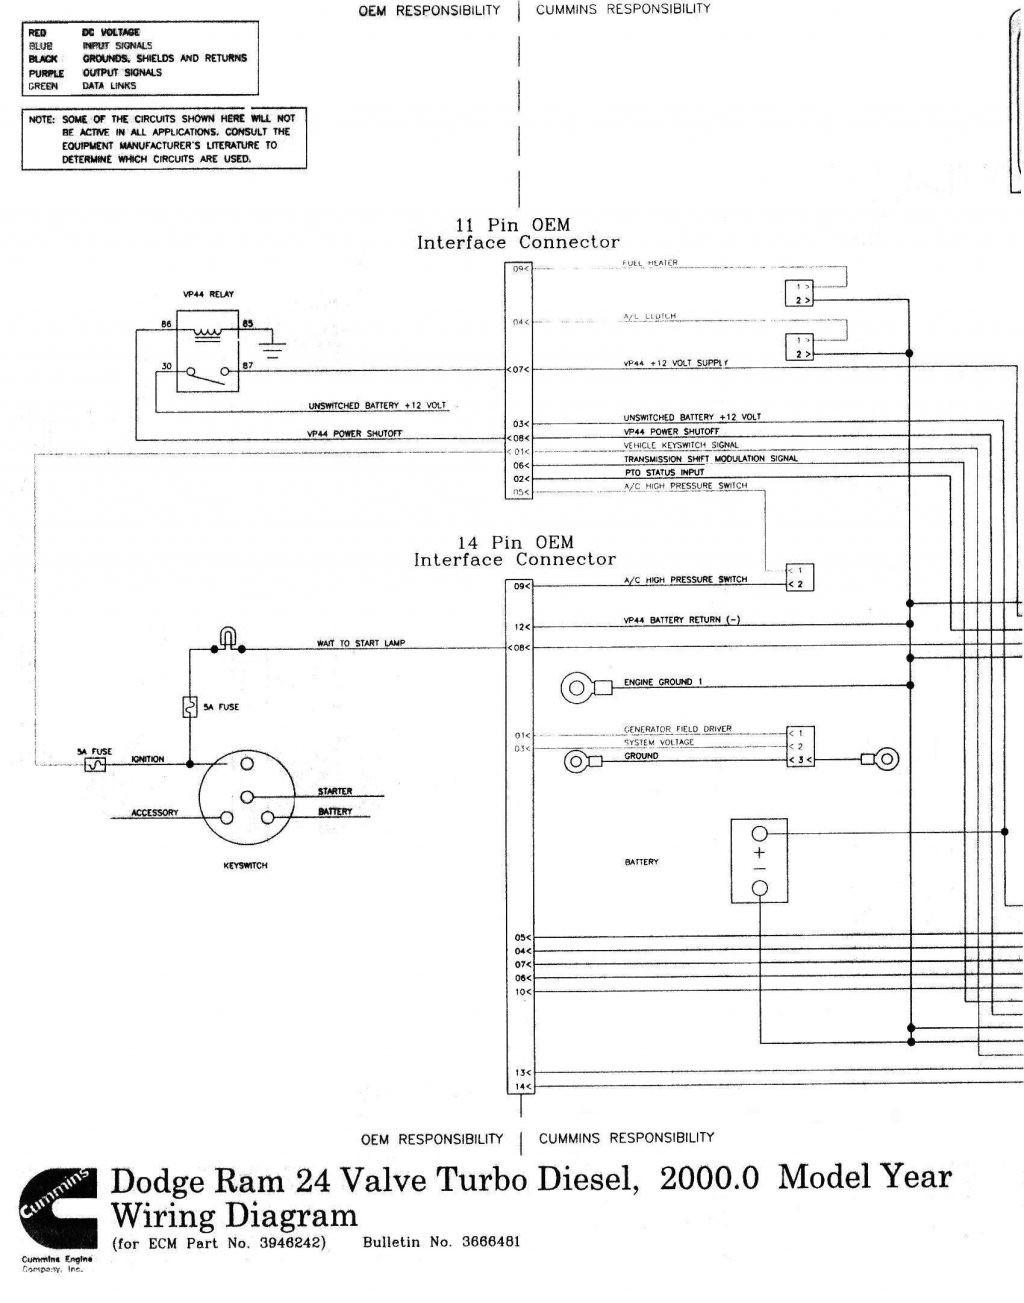 Wiring Diagram Cat Pin Ecm Dodge Ram Infinity Fresh At